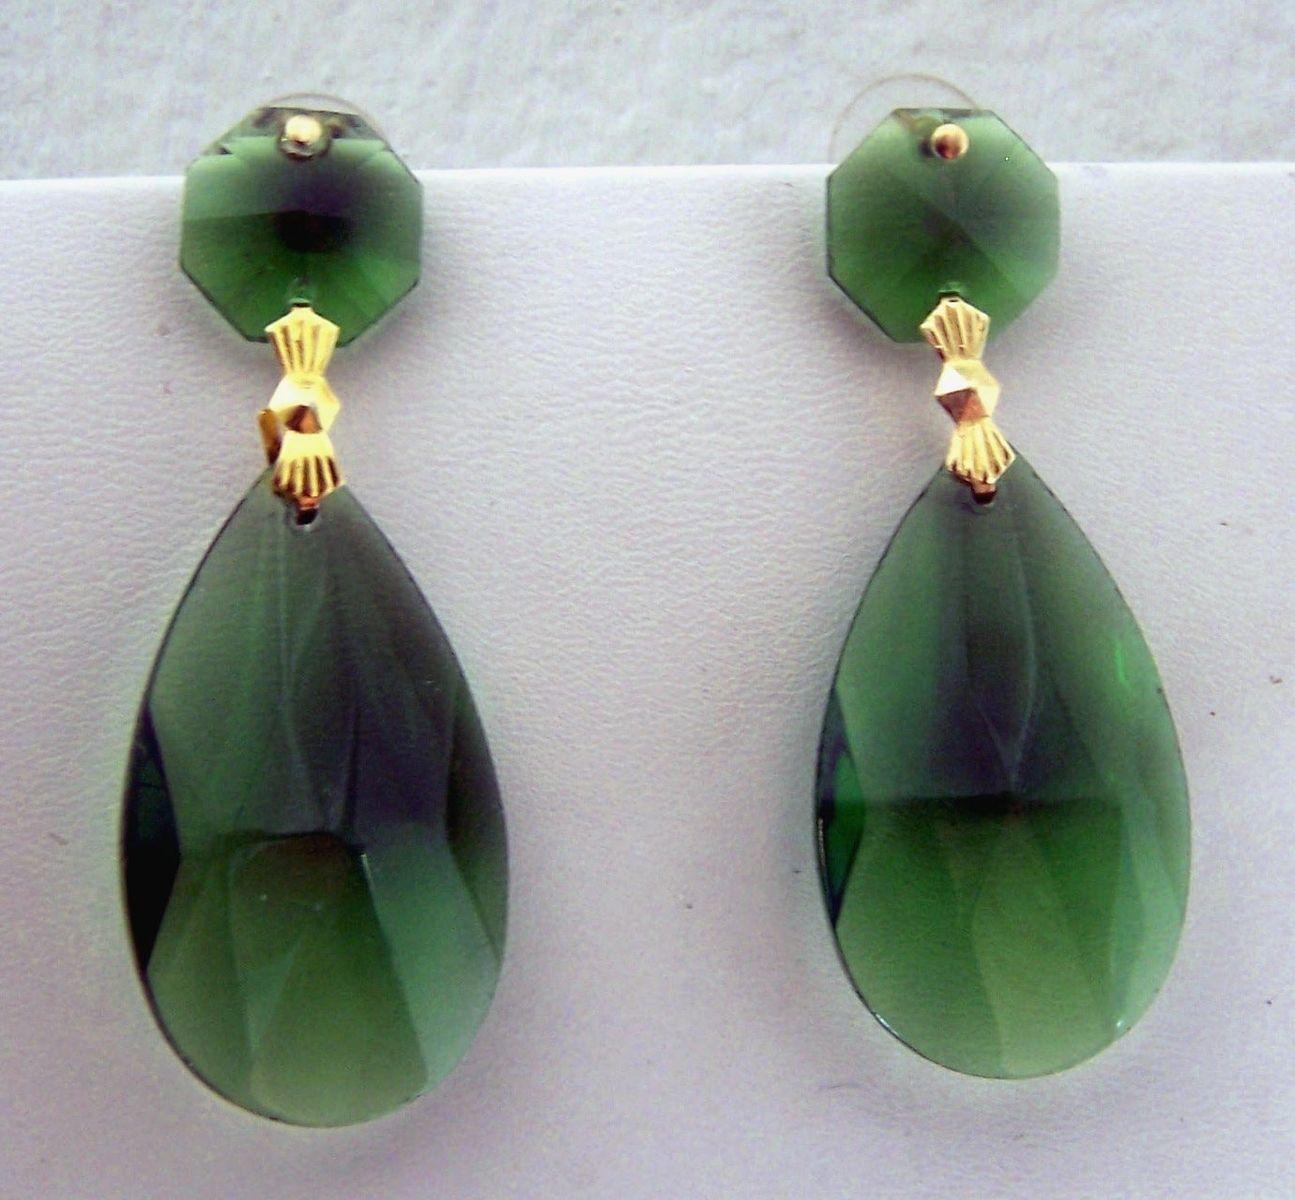 Custom Made Earrings Emerald Green Large To Order From Mandala Rain Custommade